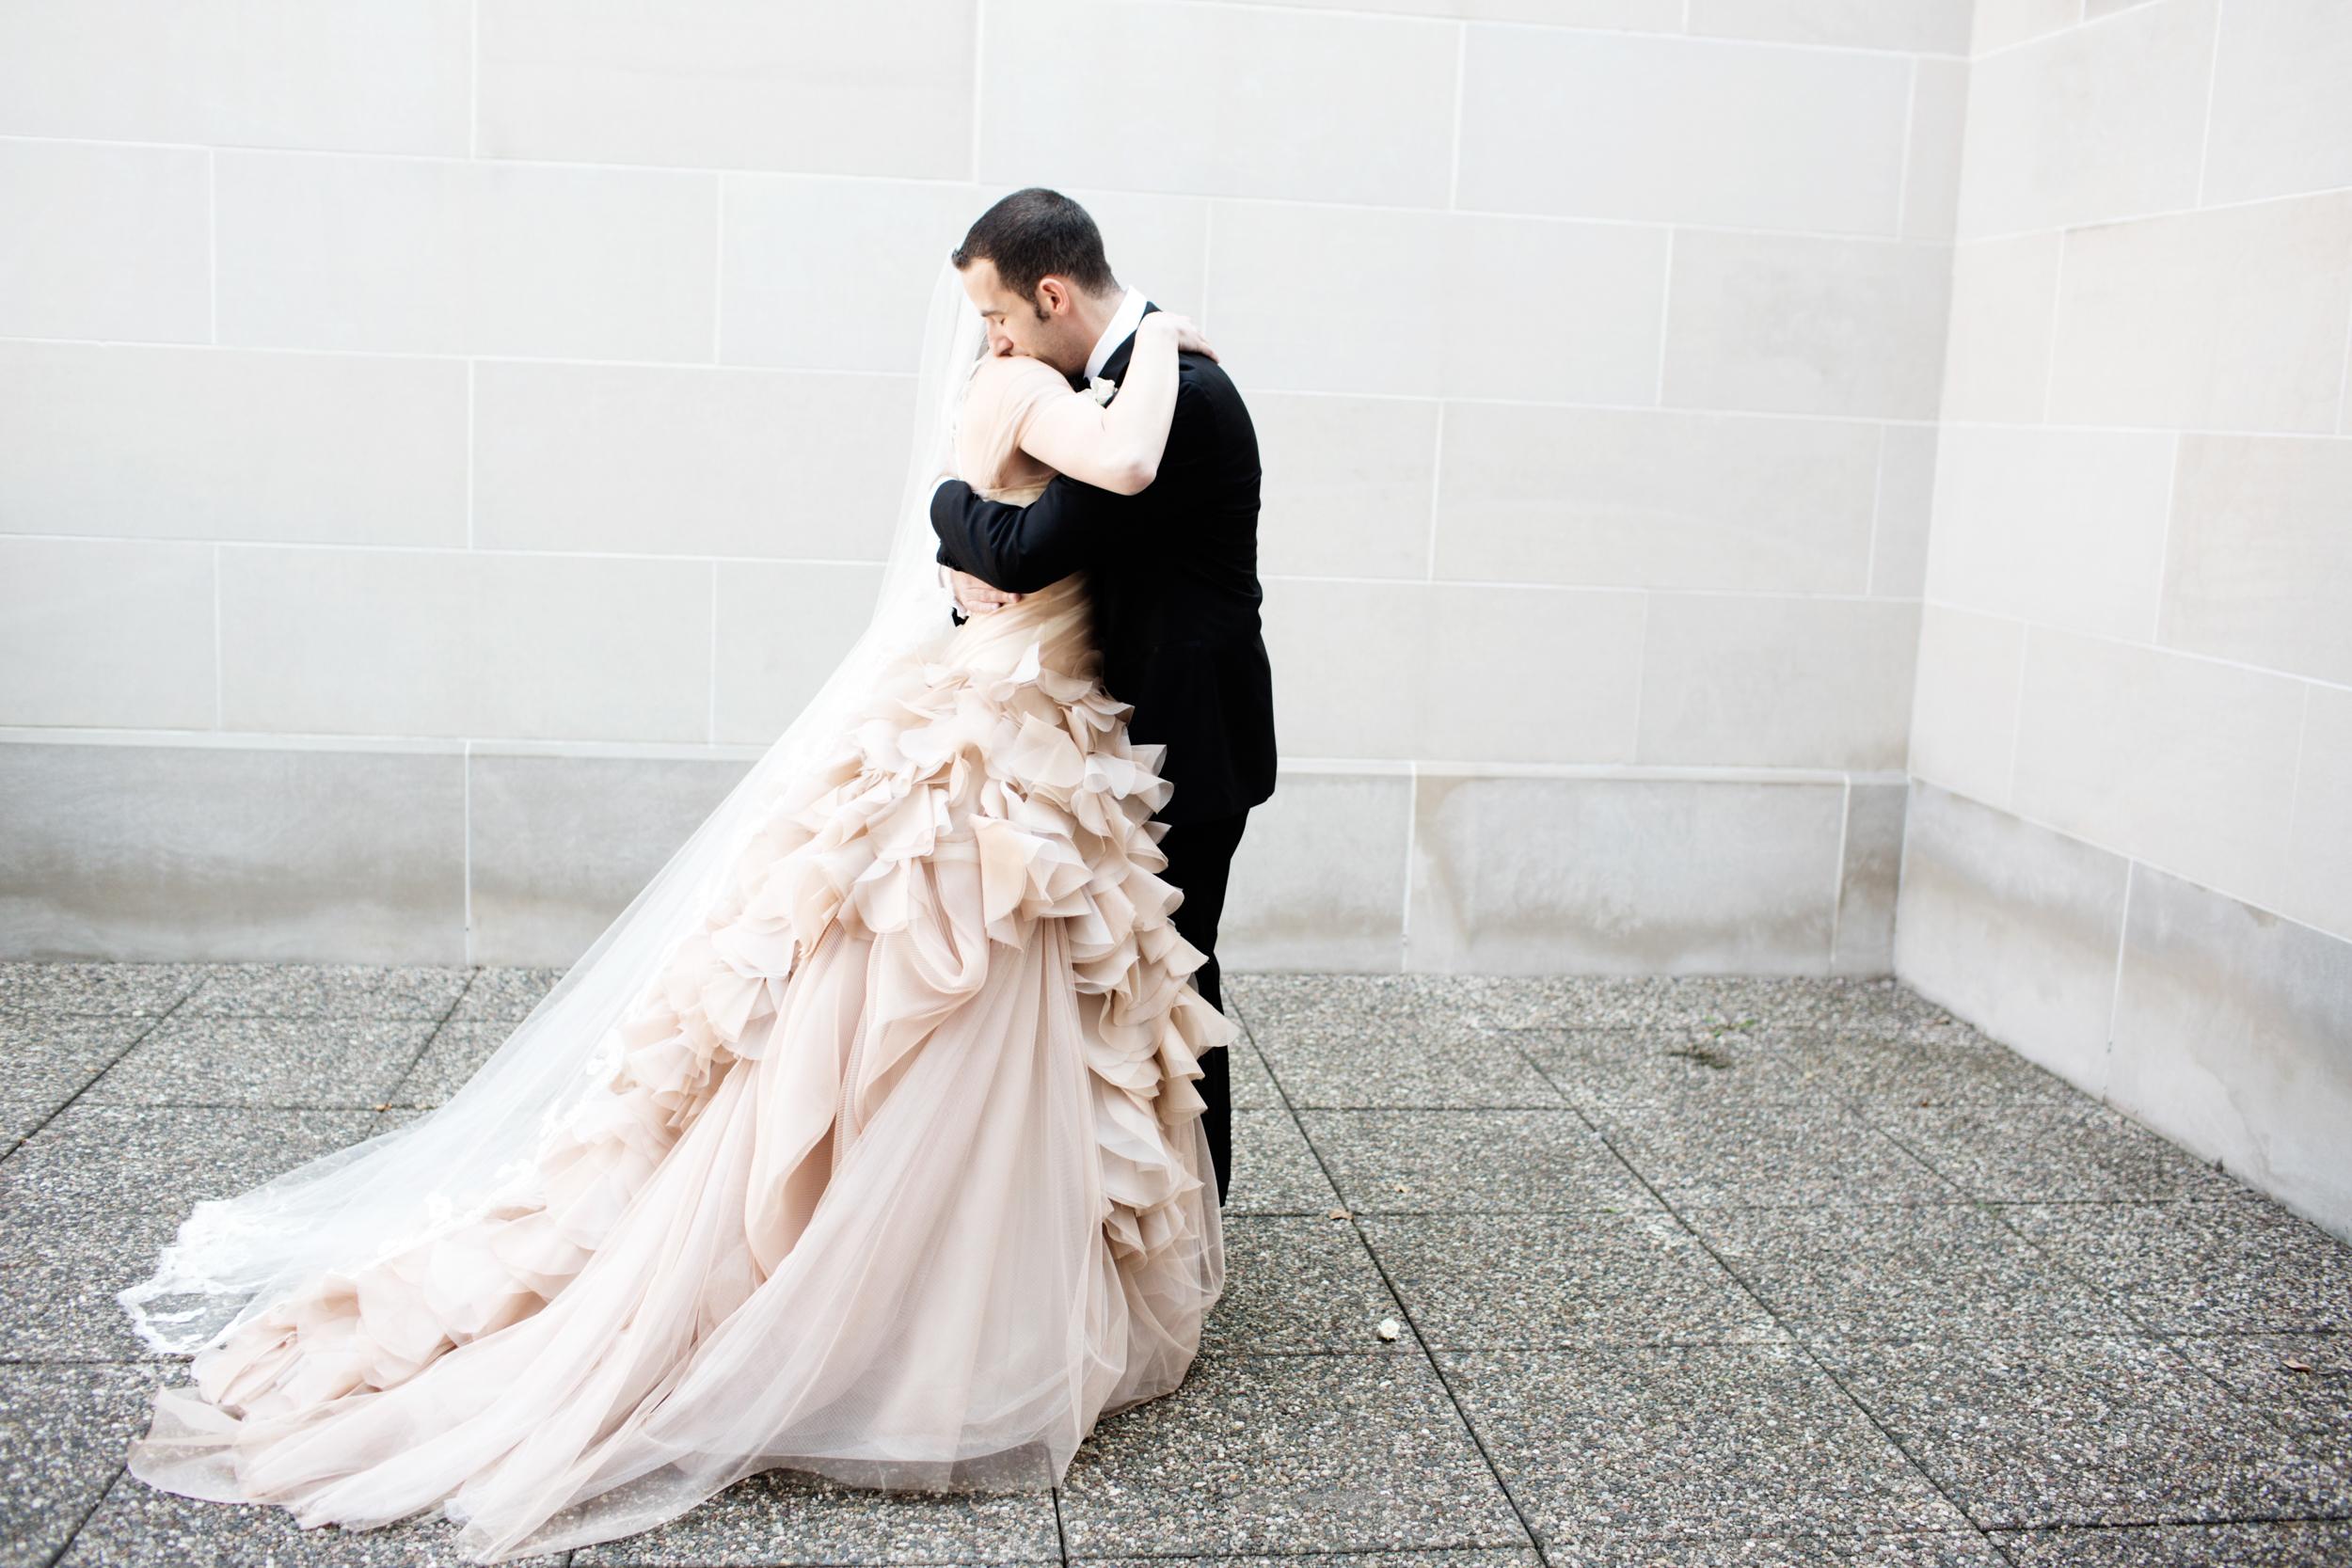 Ceci_New_York_Ceci_Style_Ceci_Johnson_Luxury_Lifestyle_Floral_Lace_Wedding_Letterpress_Inspiration_Design_Custom_Couture_Personalized_Invitations_-117.jpg